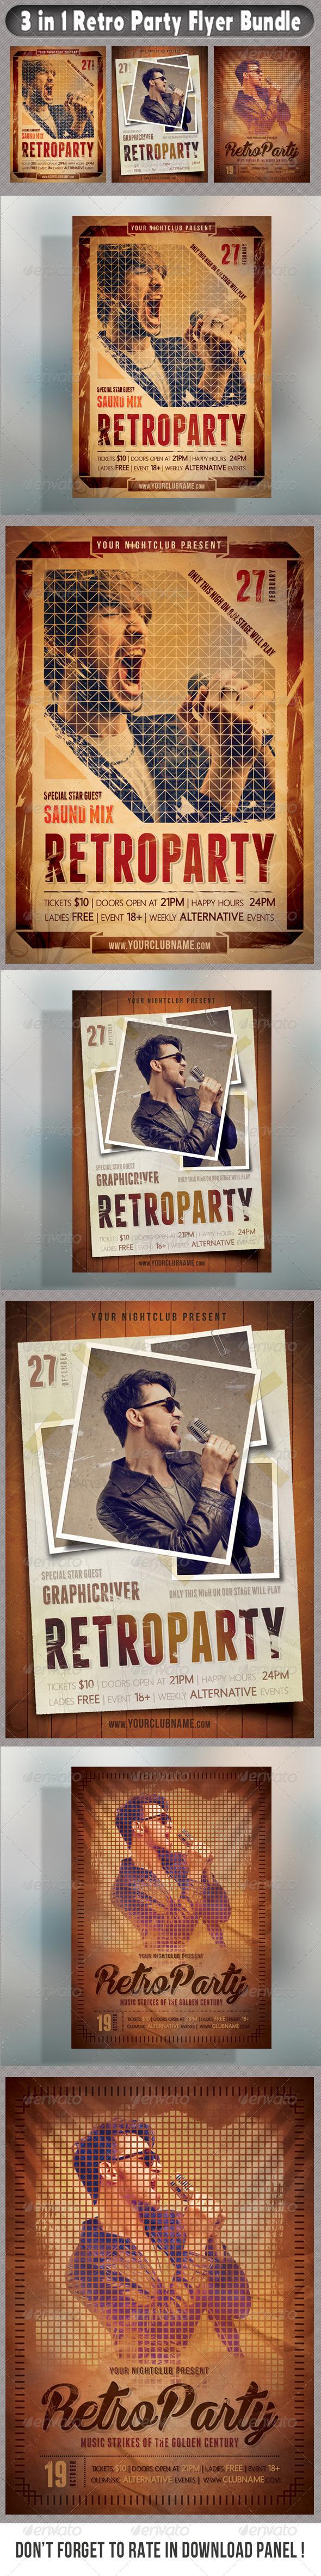 GraphicRiver 3 in 1 Retro Party Flyers Bundle 01 7695699